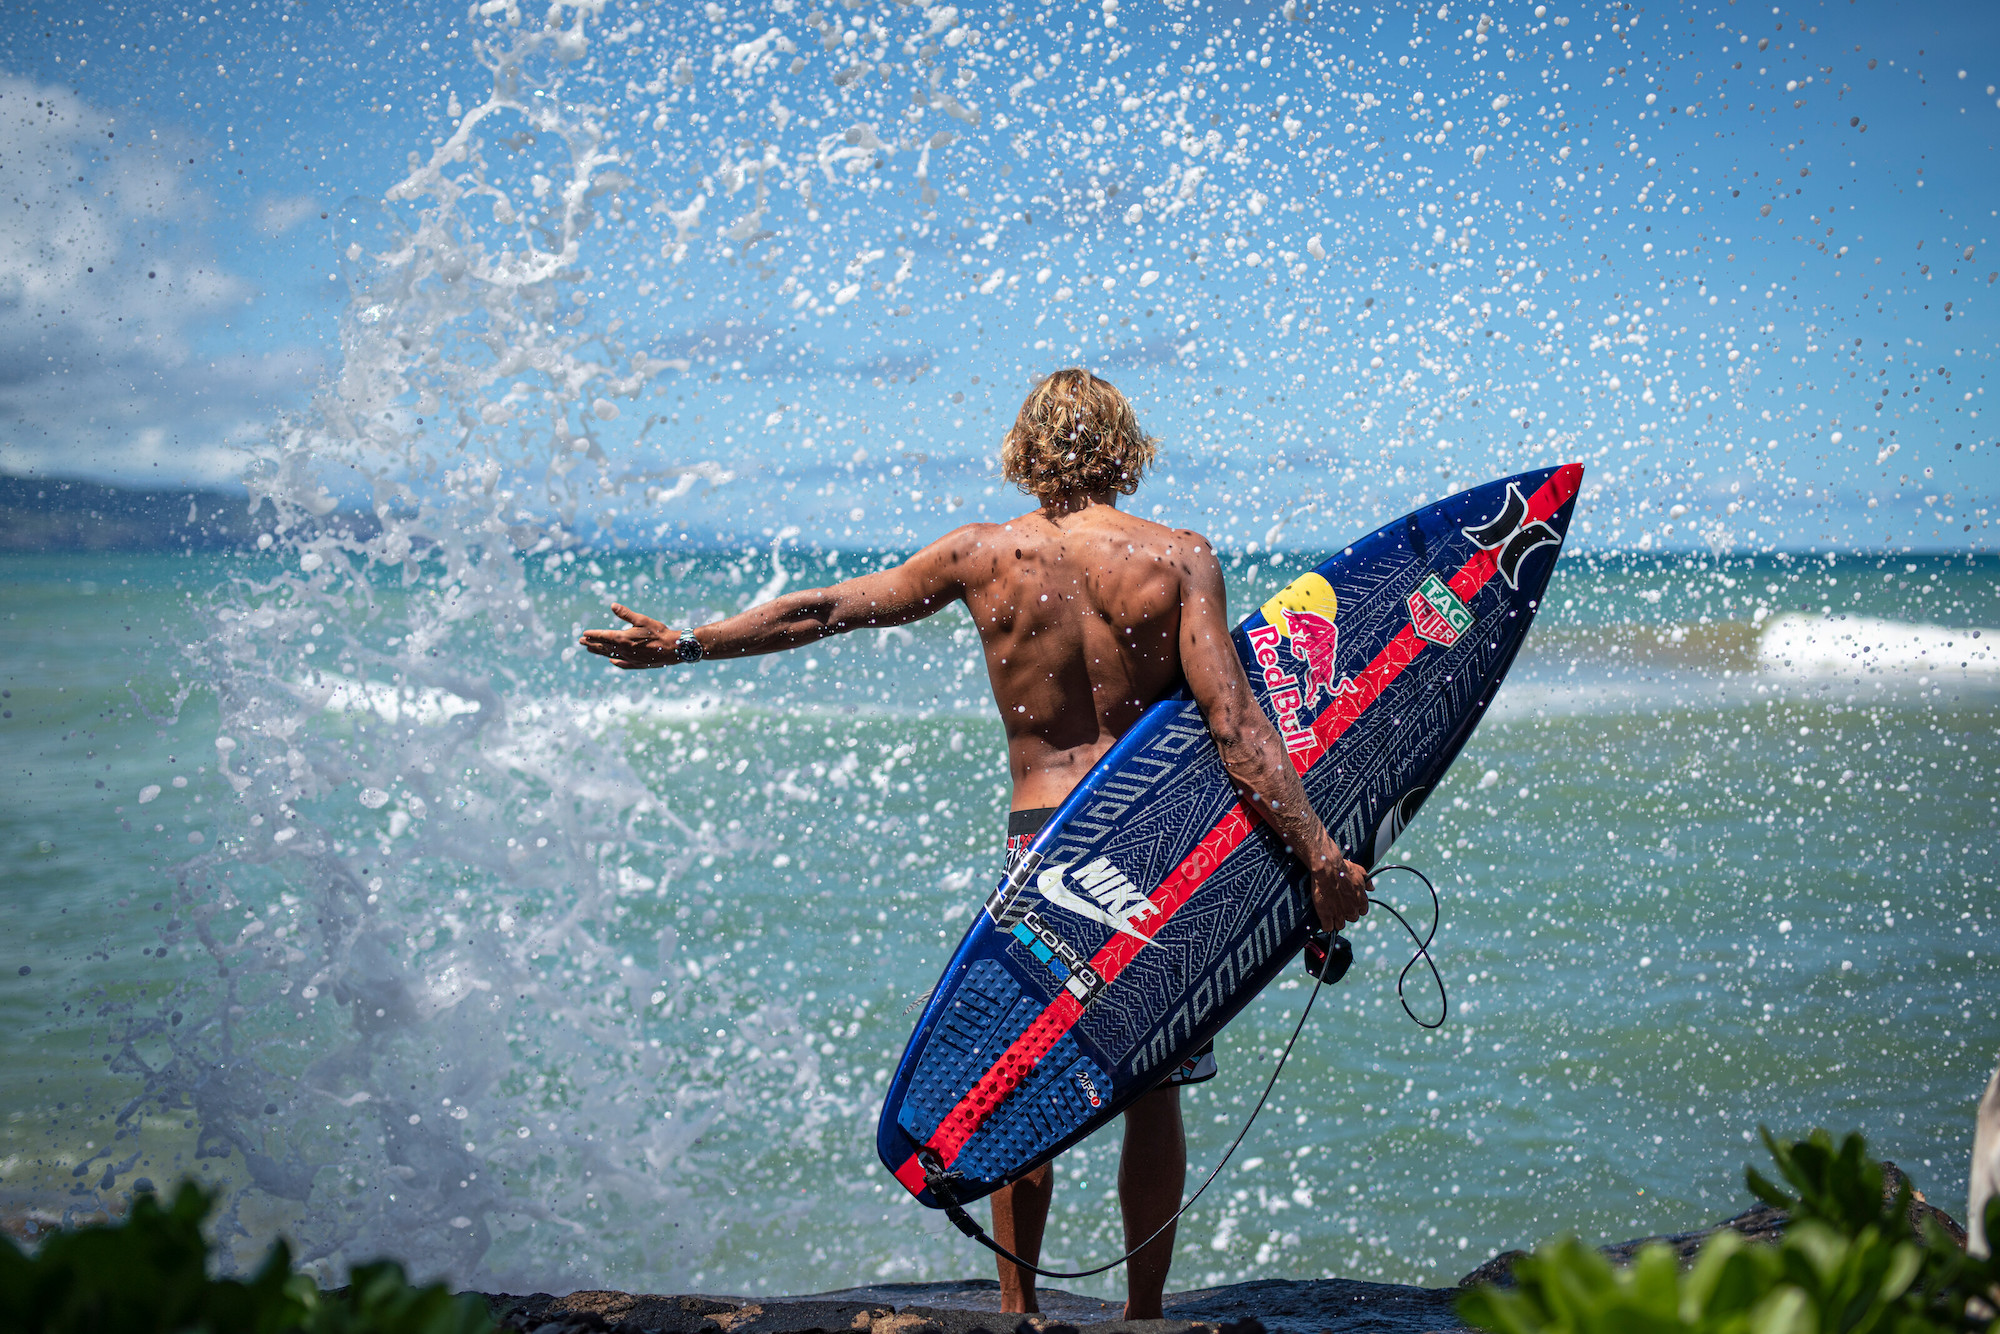 The Life Of Kai Lenny – Der Weg zum besten Big Wave Surfer der Welt